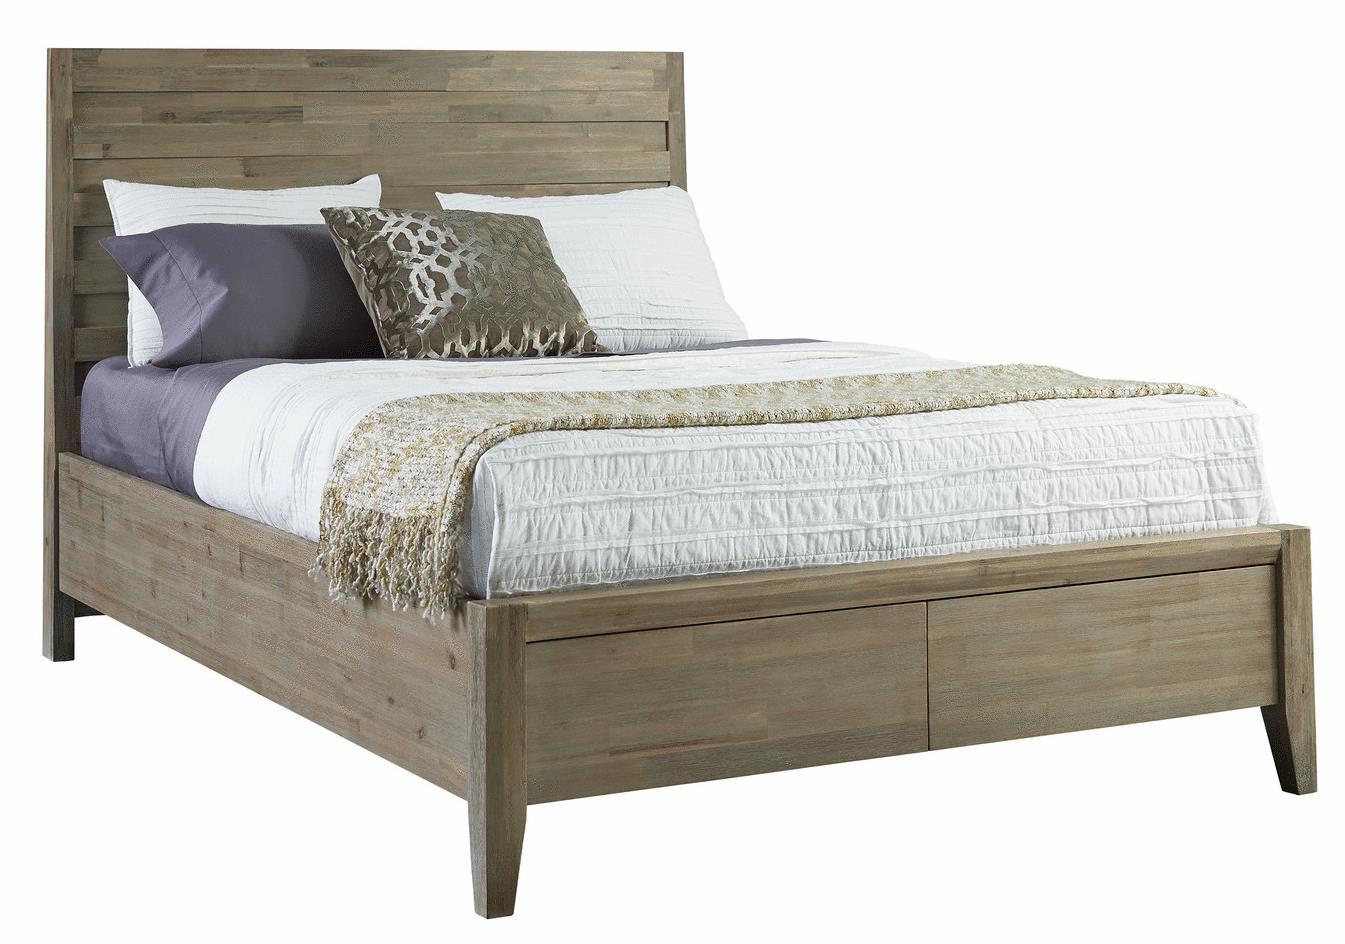 Casablanca Queen Horizontal Slat Storage Bed By Casana